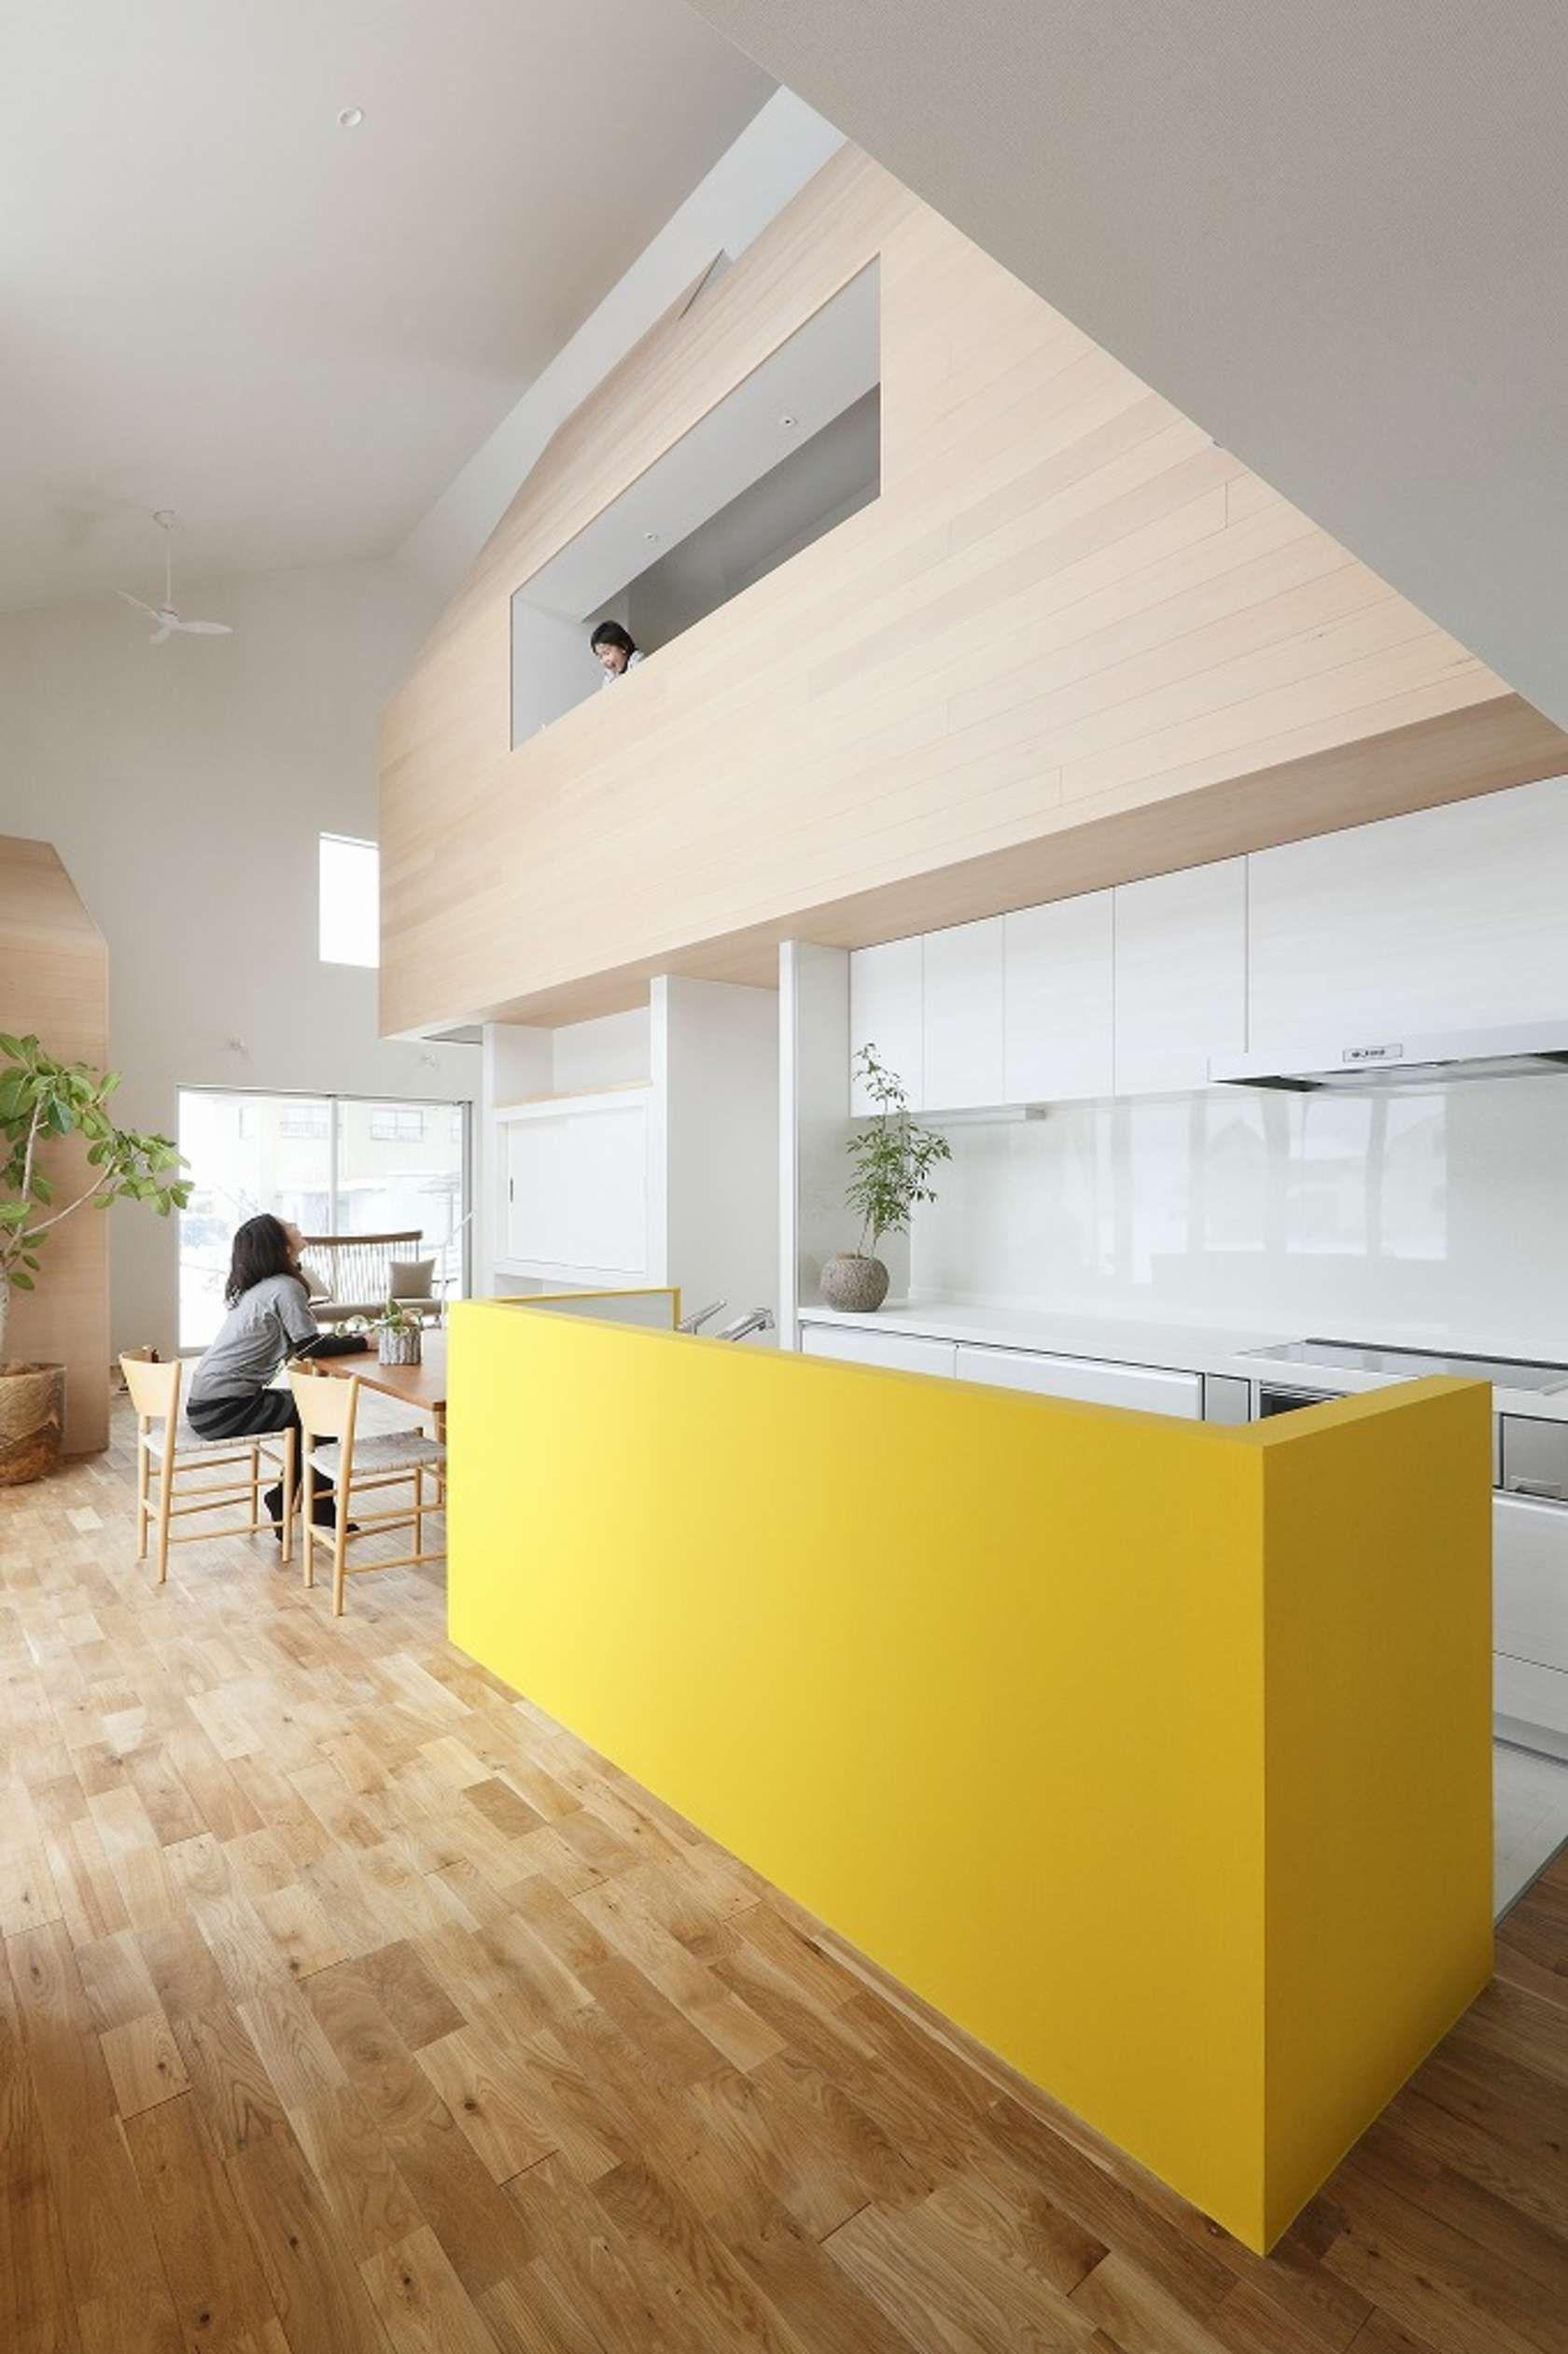 4 Homes That Celebrate Modern Minimalism #Homedecor #Homedecorideas  #Homedesign #Homedecoraccessories #Homedecoration #Homedesignideas  #Livingroomideas # ...